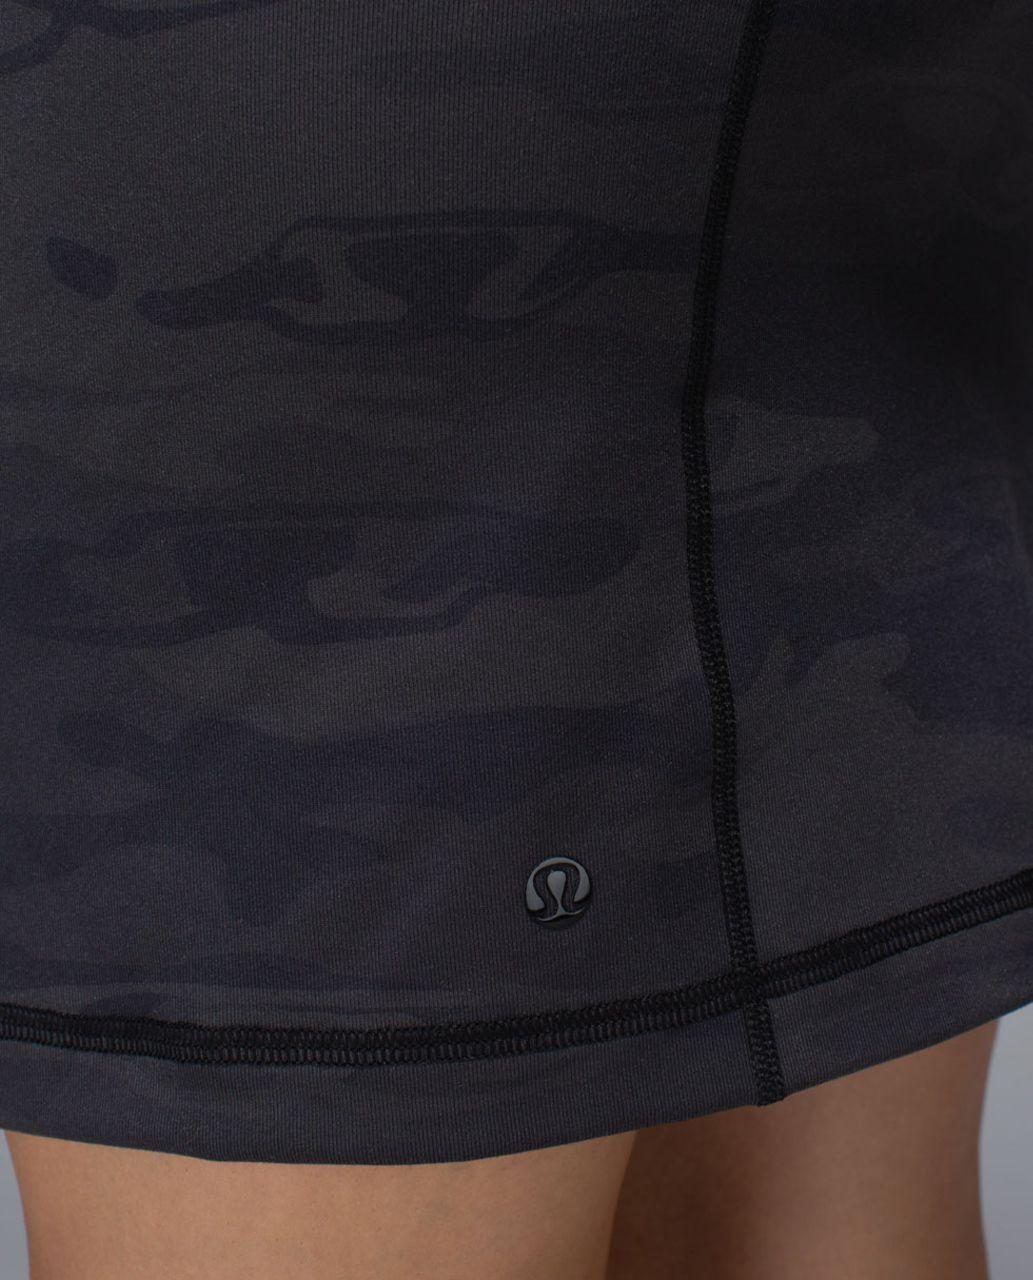 Lululemon Rocket Skirt - Black /  Retro Camo